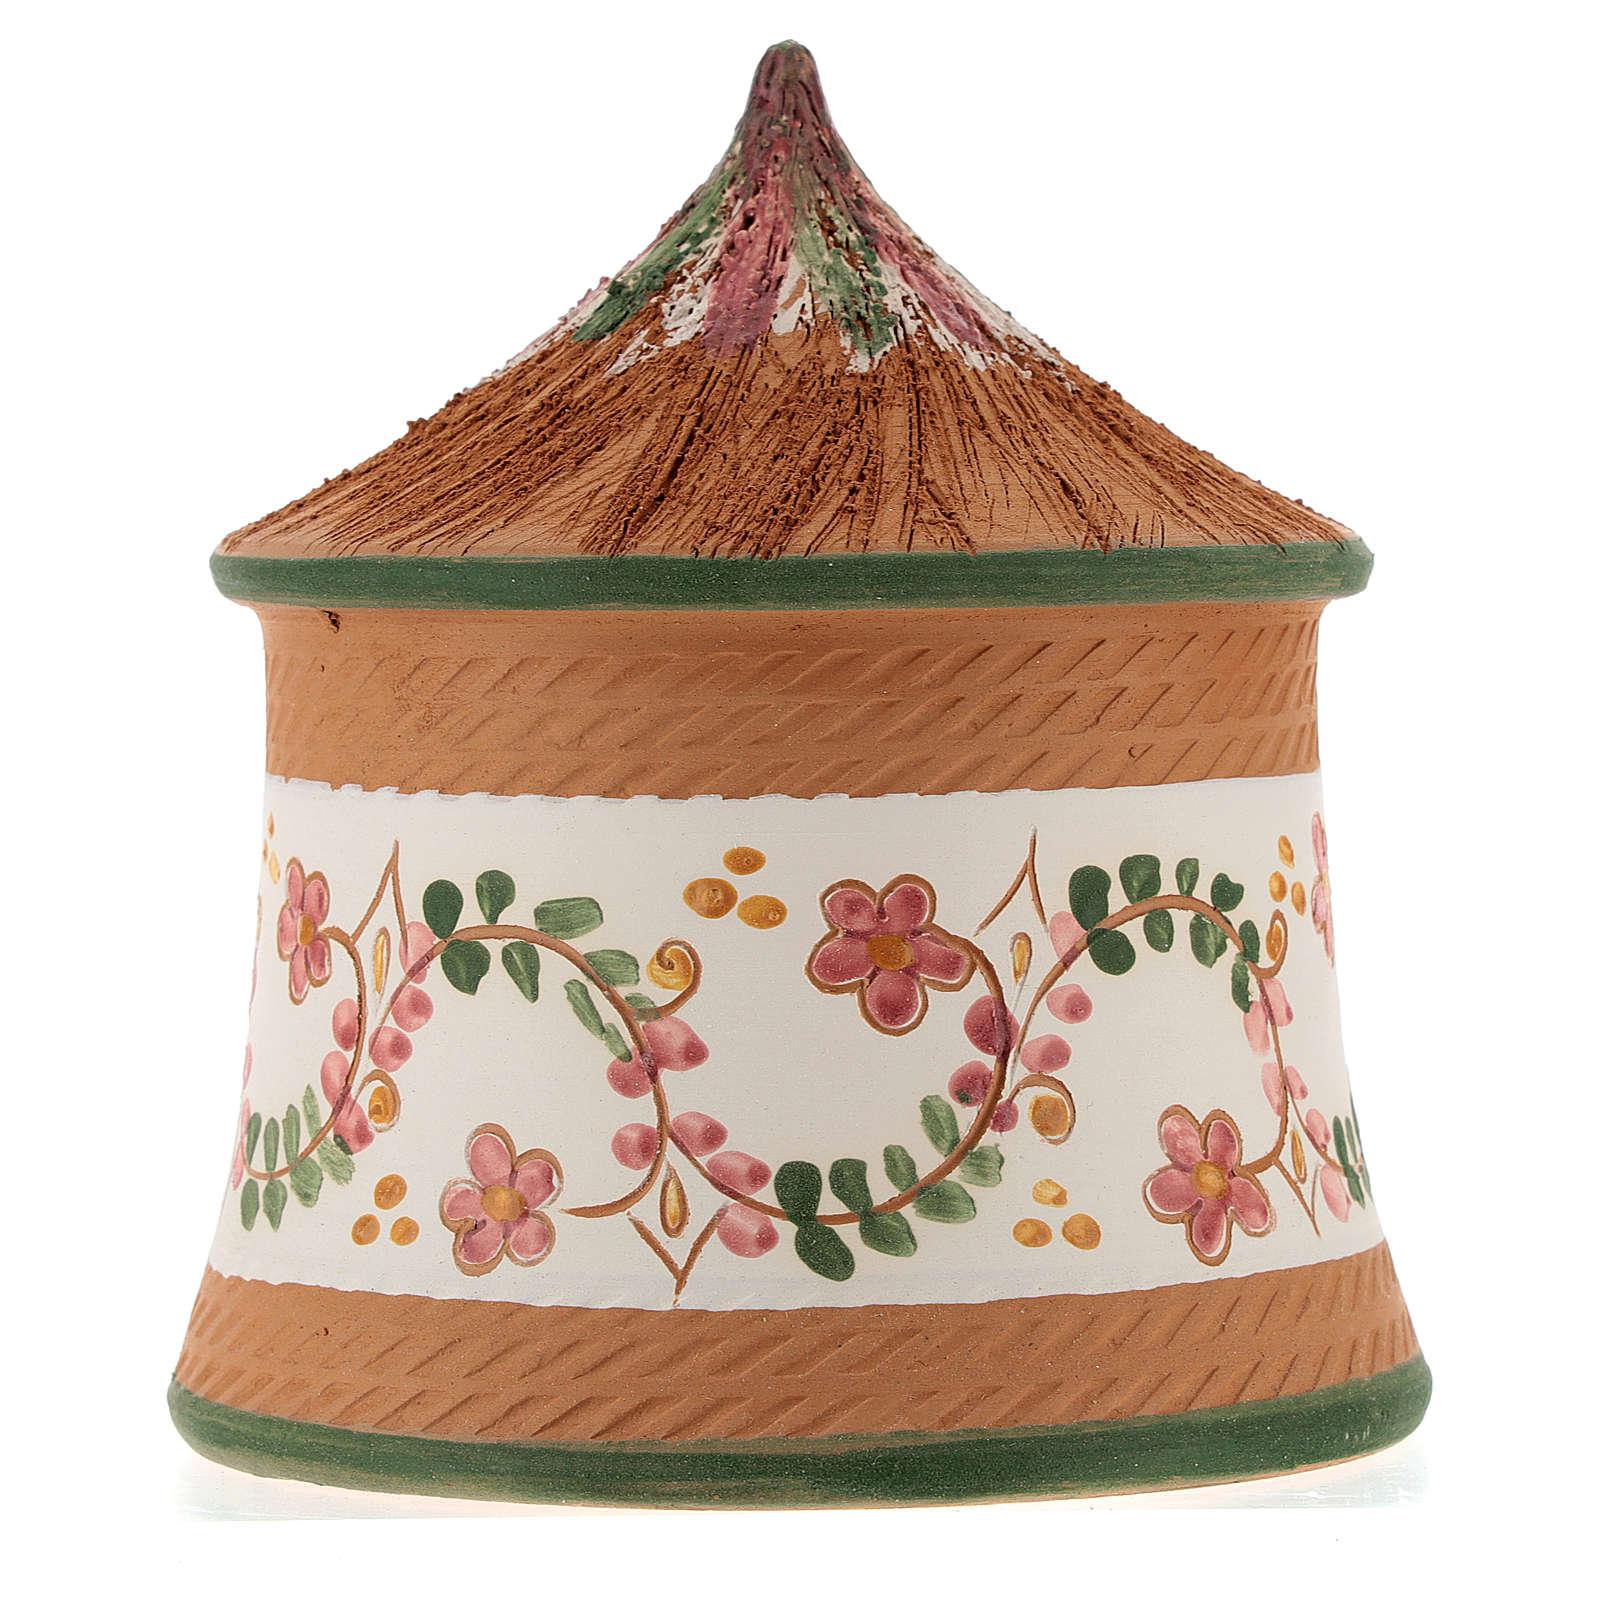 Cabaña cerámica natividad 4 cm coloreada country verde 15x10x10 cm Deruta 4